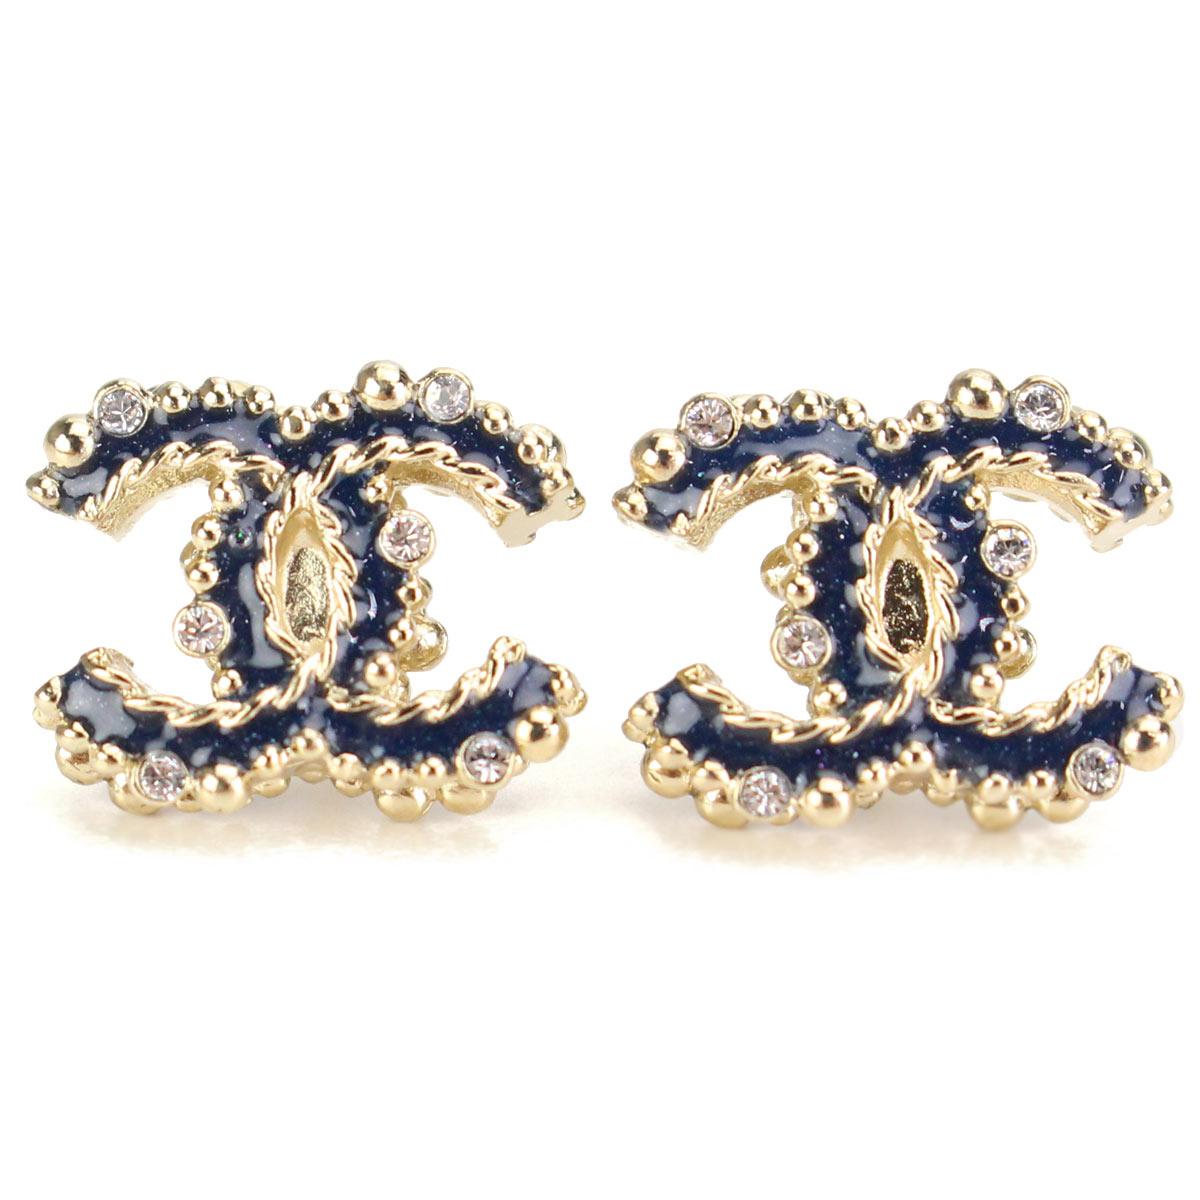 Hit The Total Brand Whole Rakuten Global Market Chanel Rhinestone Here Mark Pierced Earrings A97576 Gold Navy Bl ジルコ